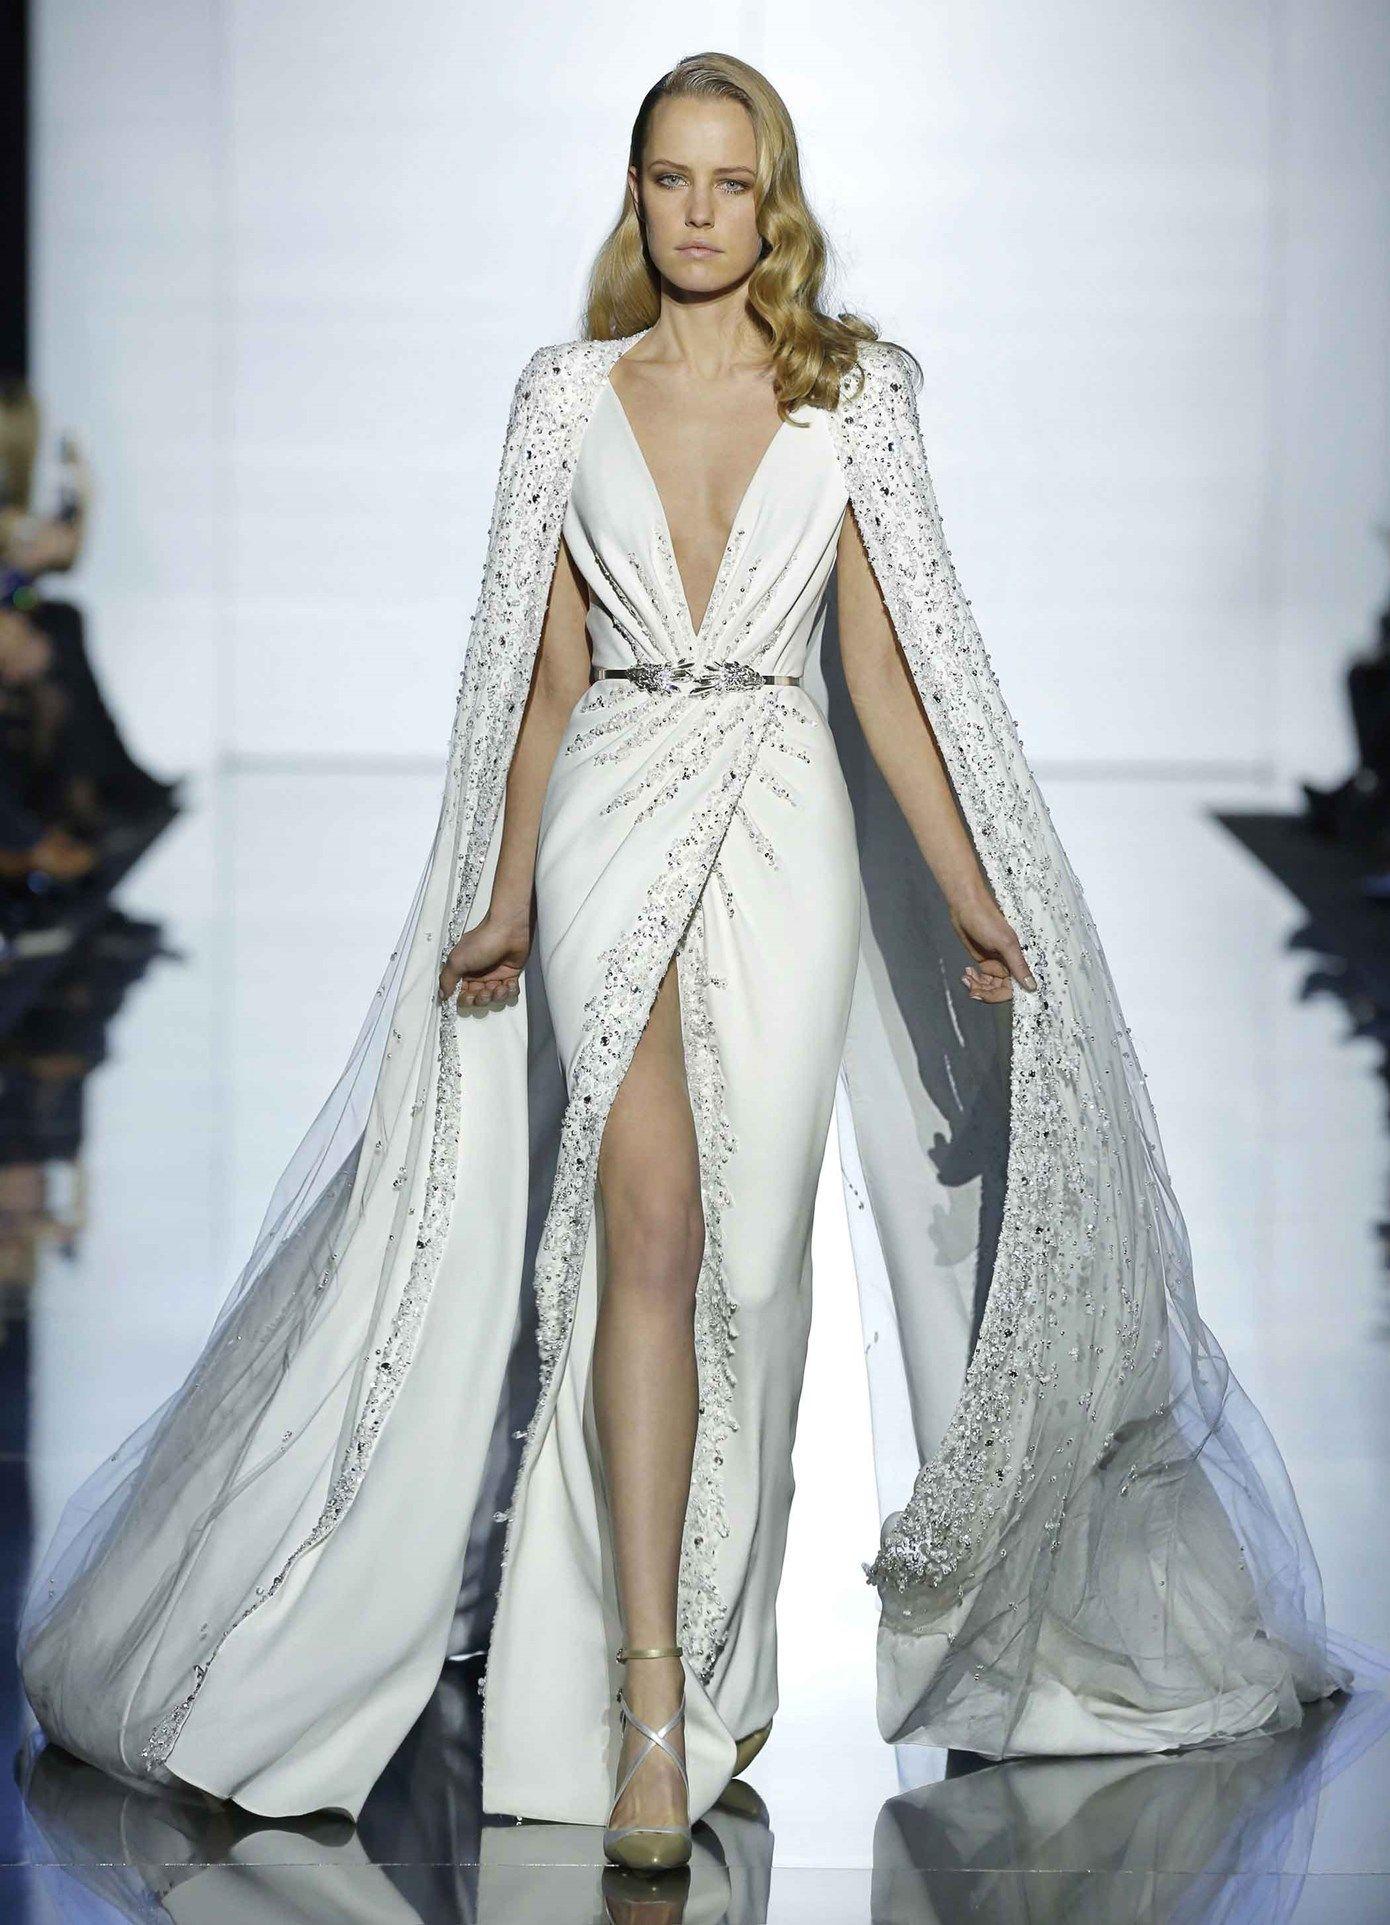 zuhair murad white dress haute couture pinterest kleider sch ne frauen. Black Bedroom Furniture Sets. Home Design Ideas